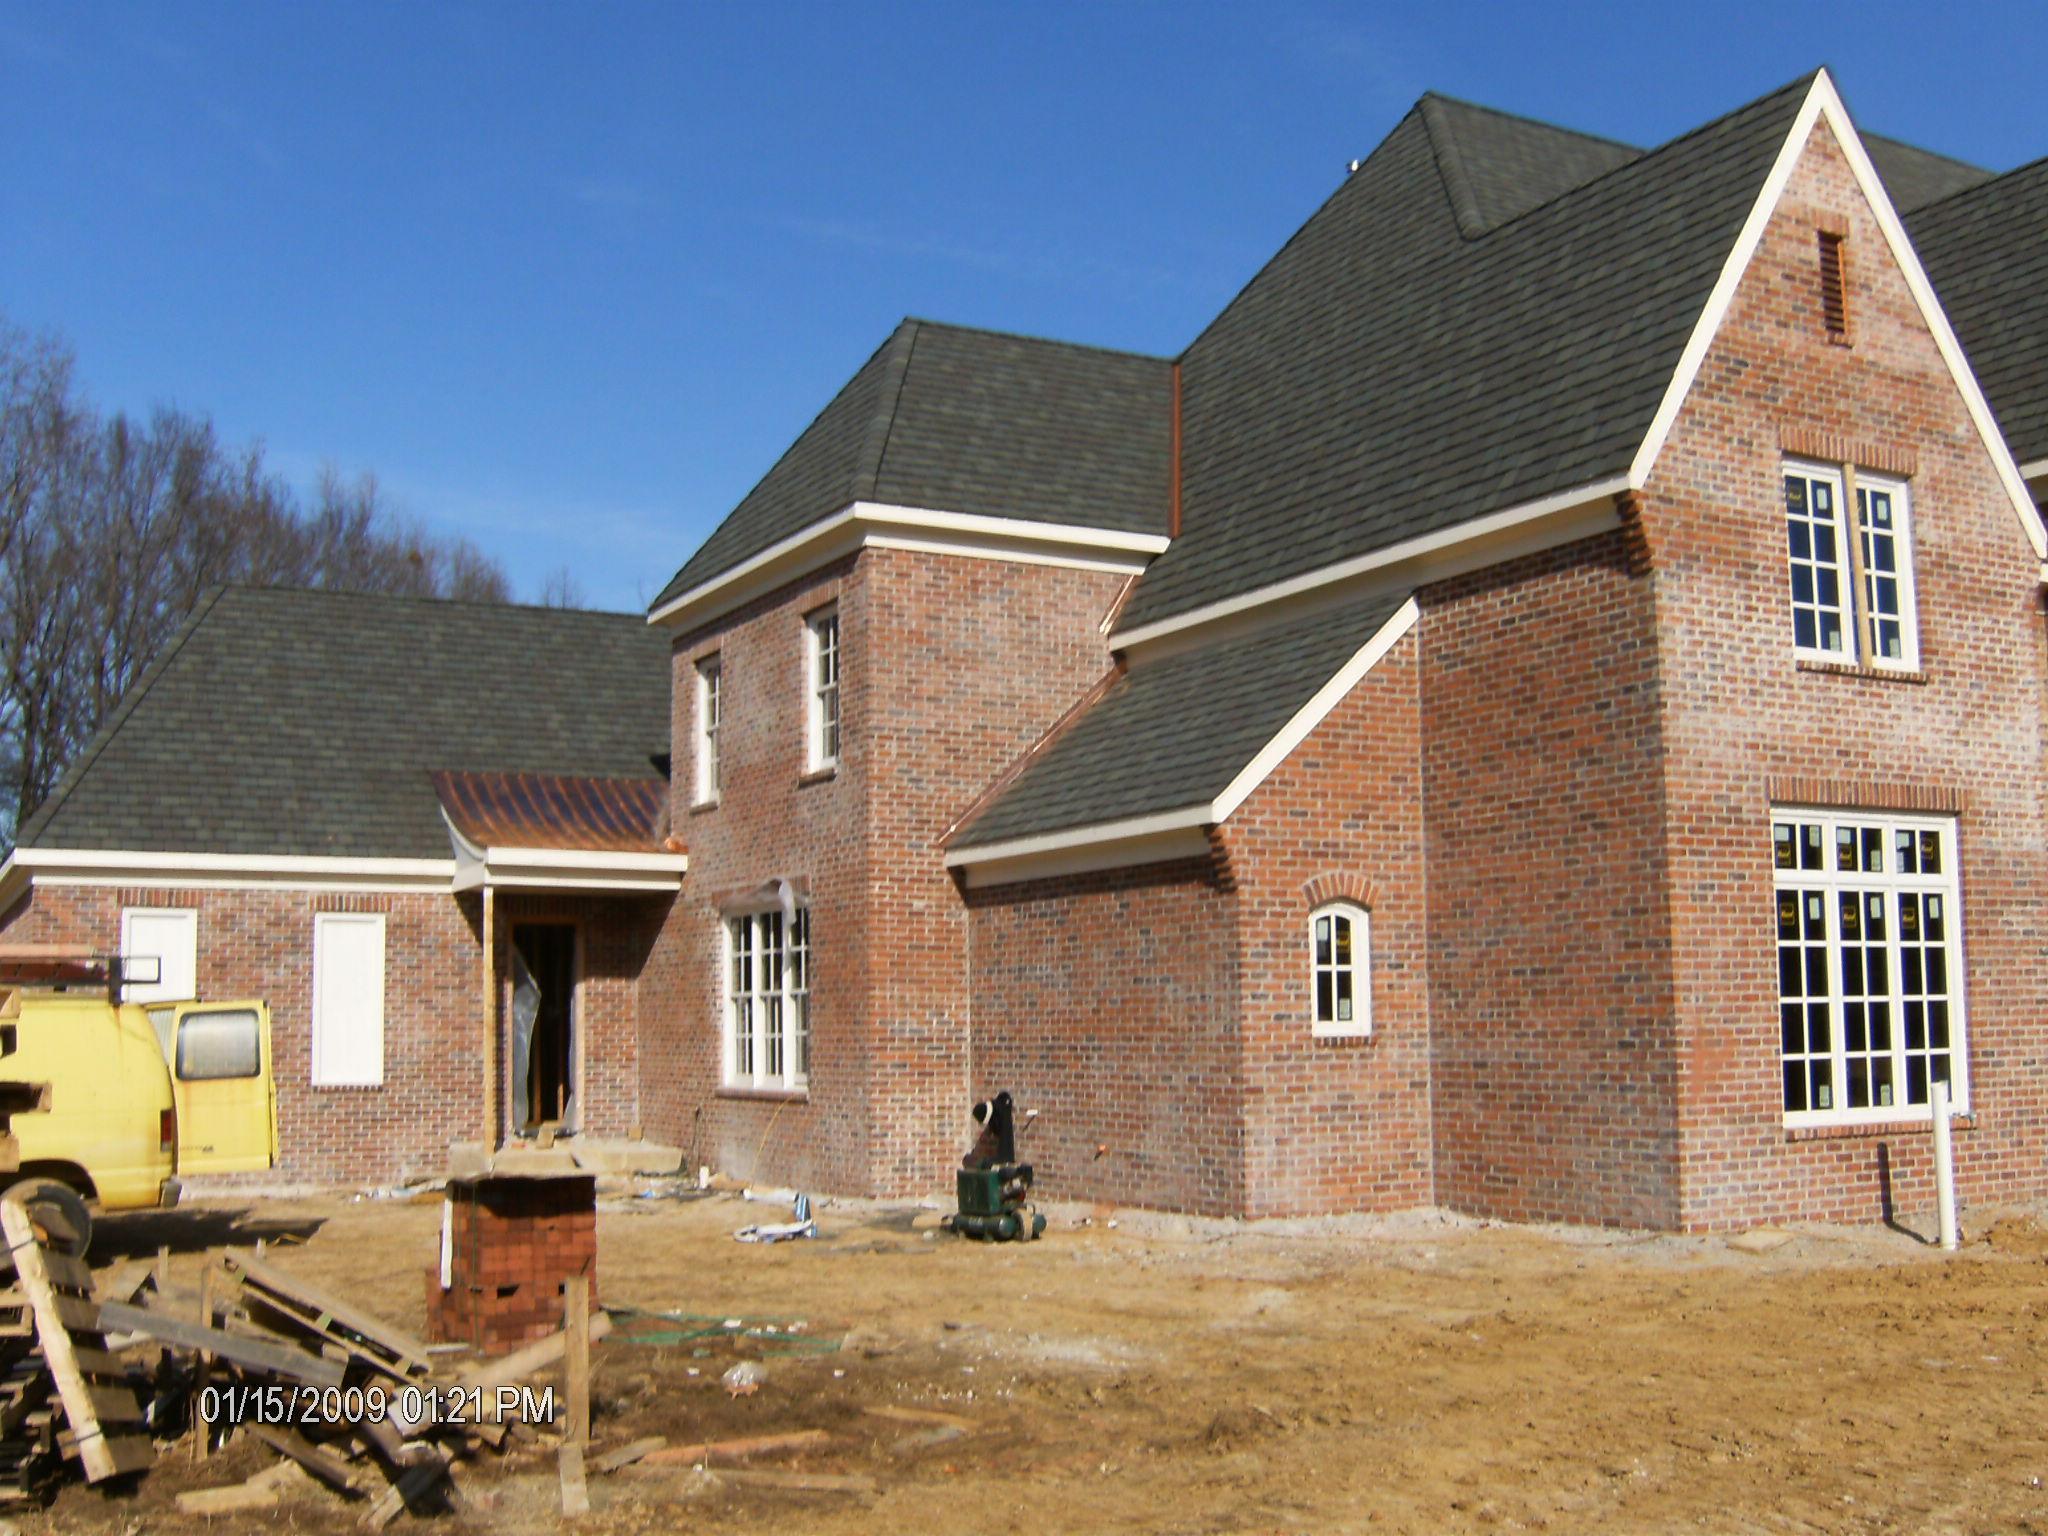 Steadman Roofing